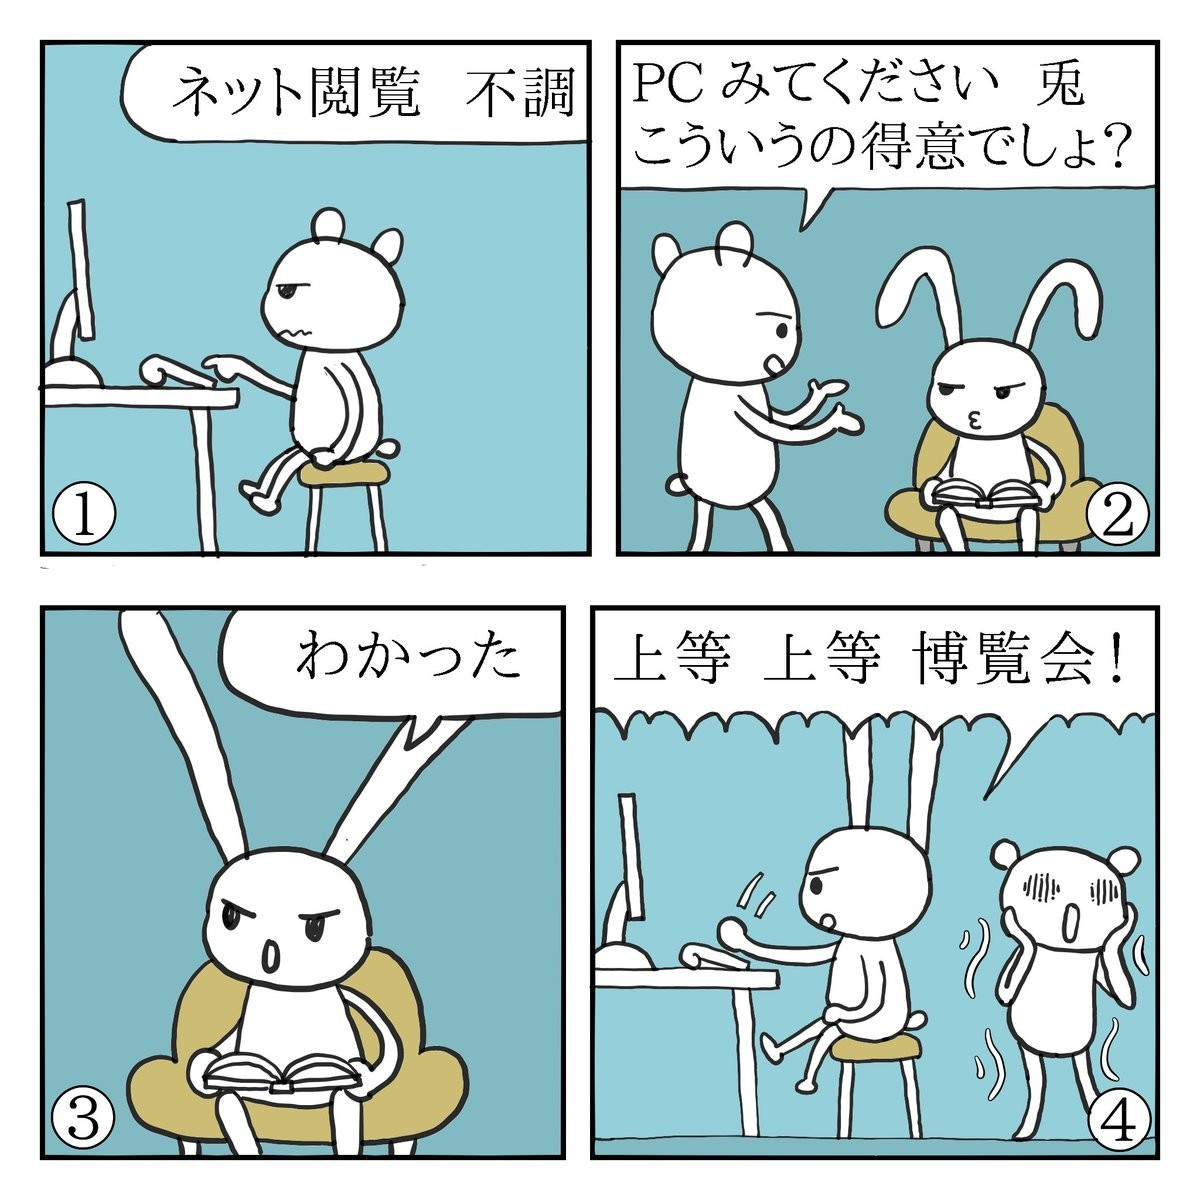 f:id:kanarihikokuma:20190319081541j:image:w330